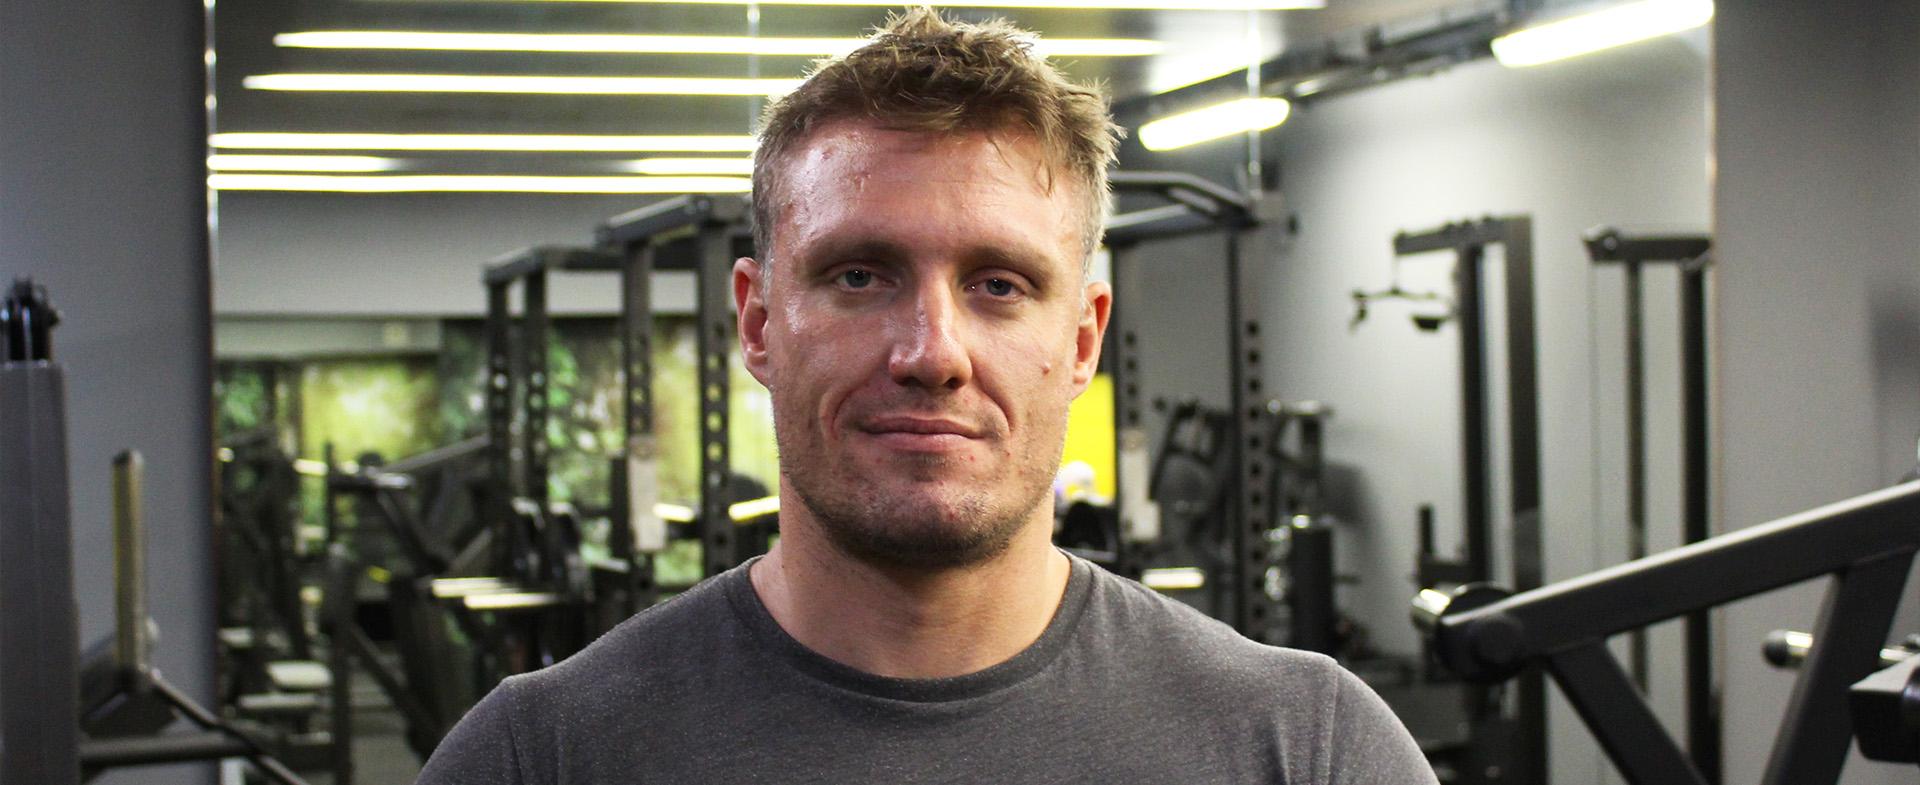 Richard Cross Studio Trainer The Cut Gym London